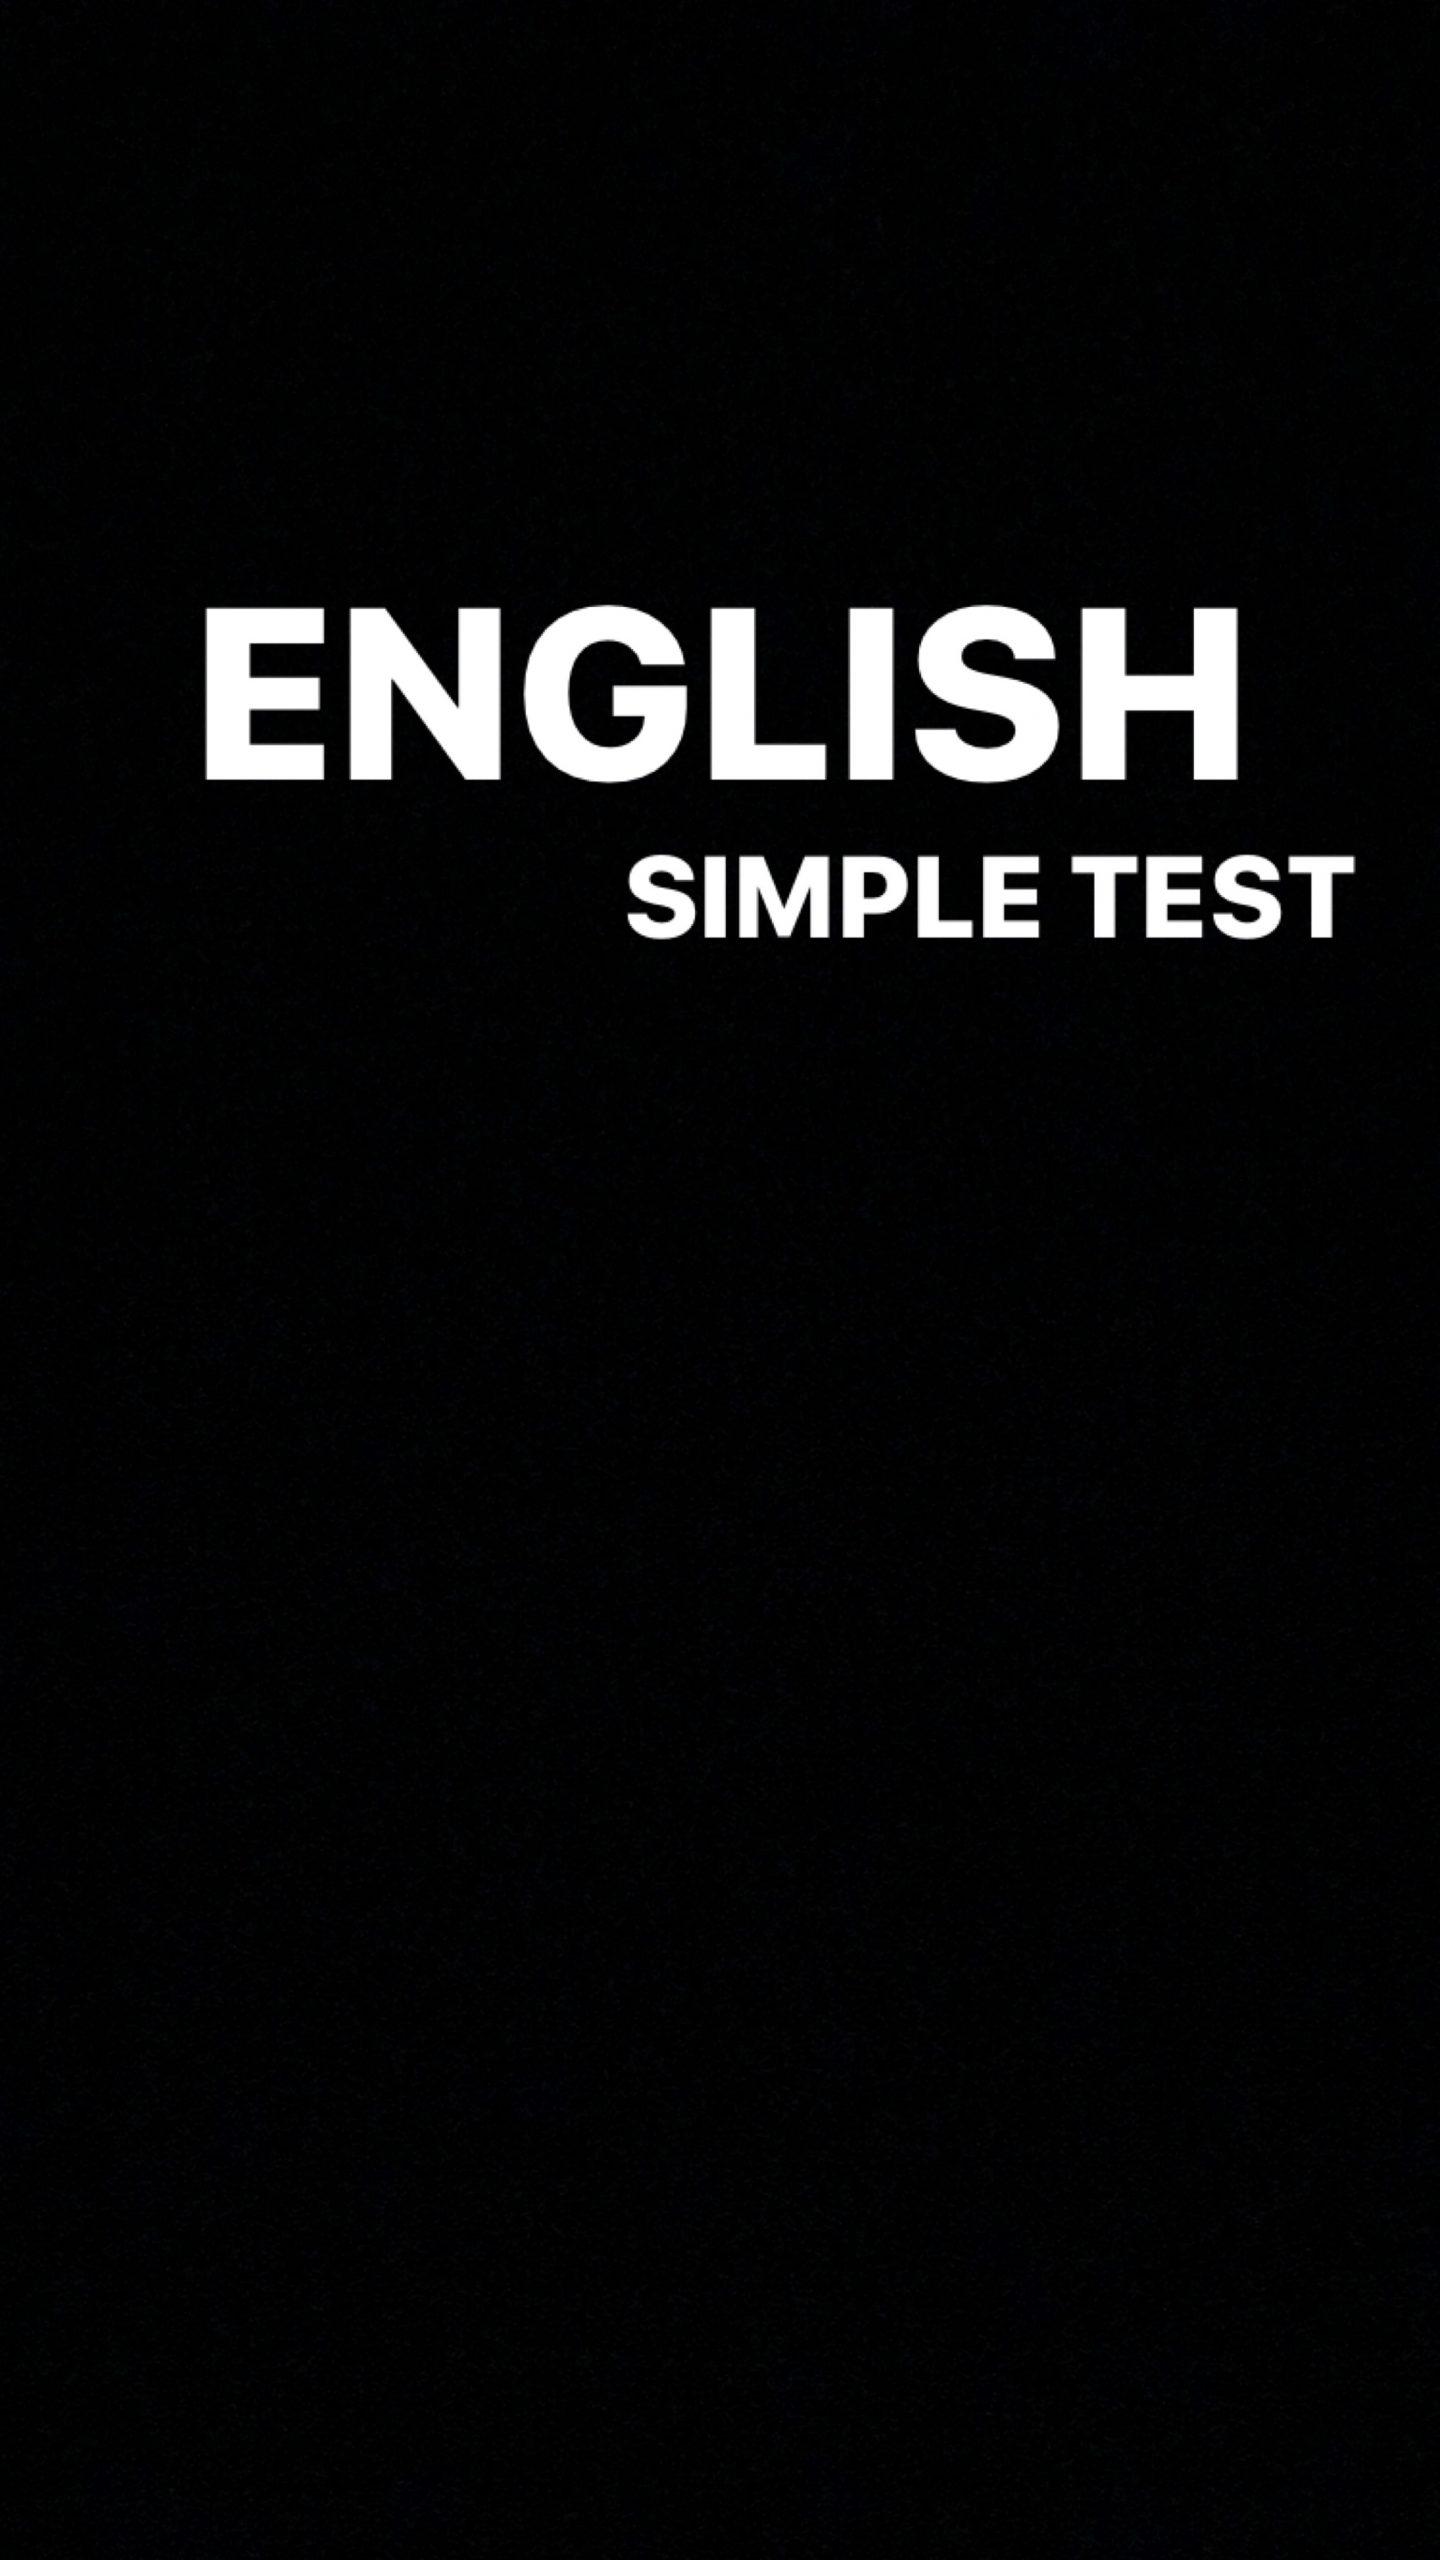 Simple English Quiz